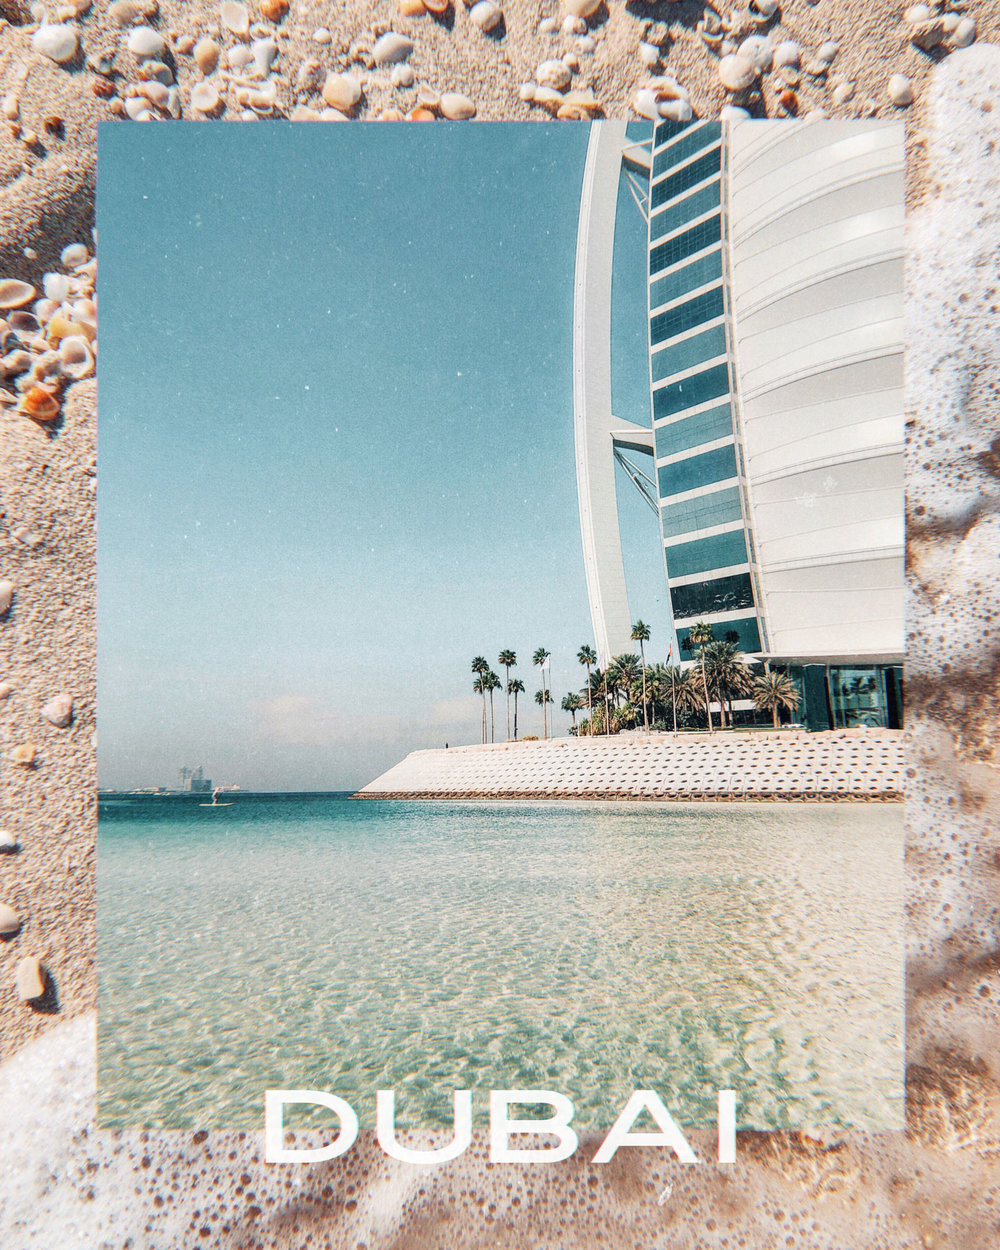 Dubai Collage Burj Al Arab Travel Photography / Dubai Travel Tips